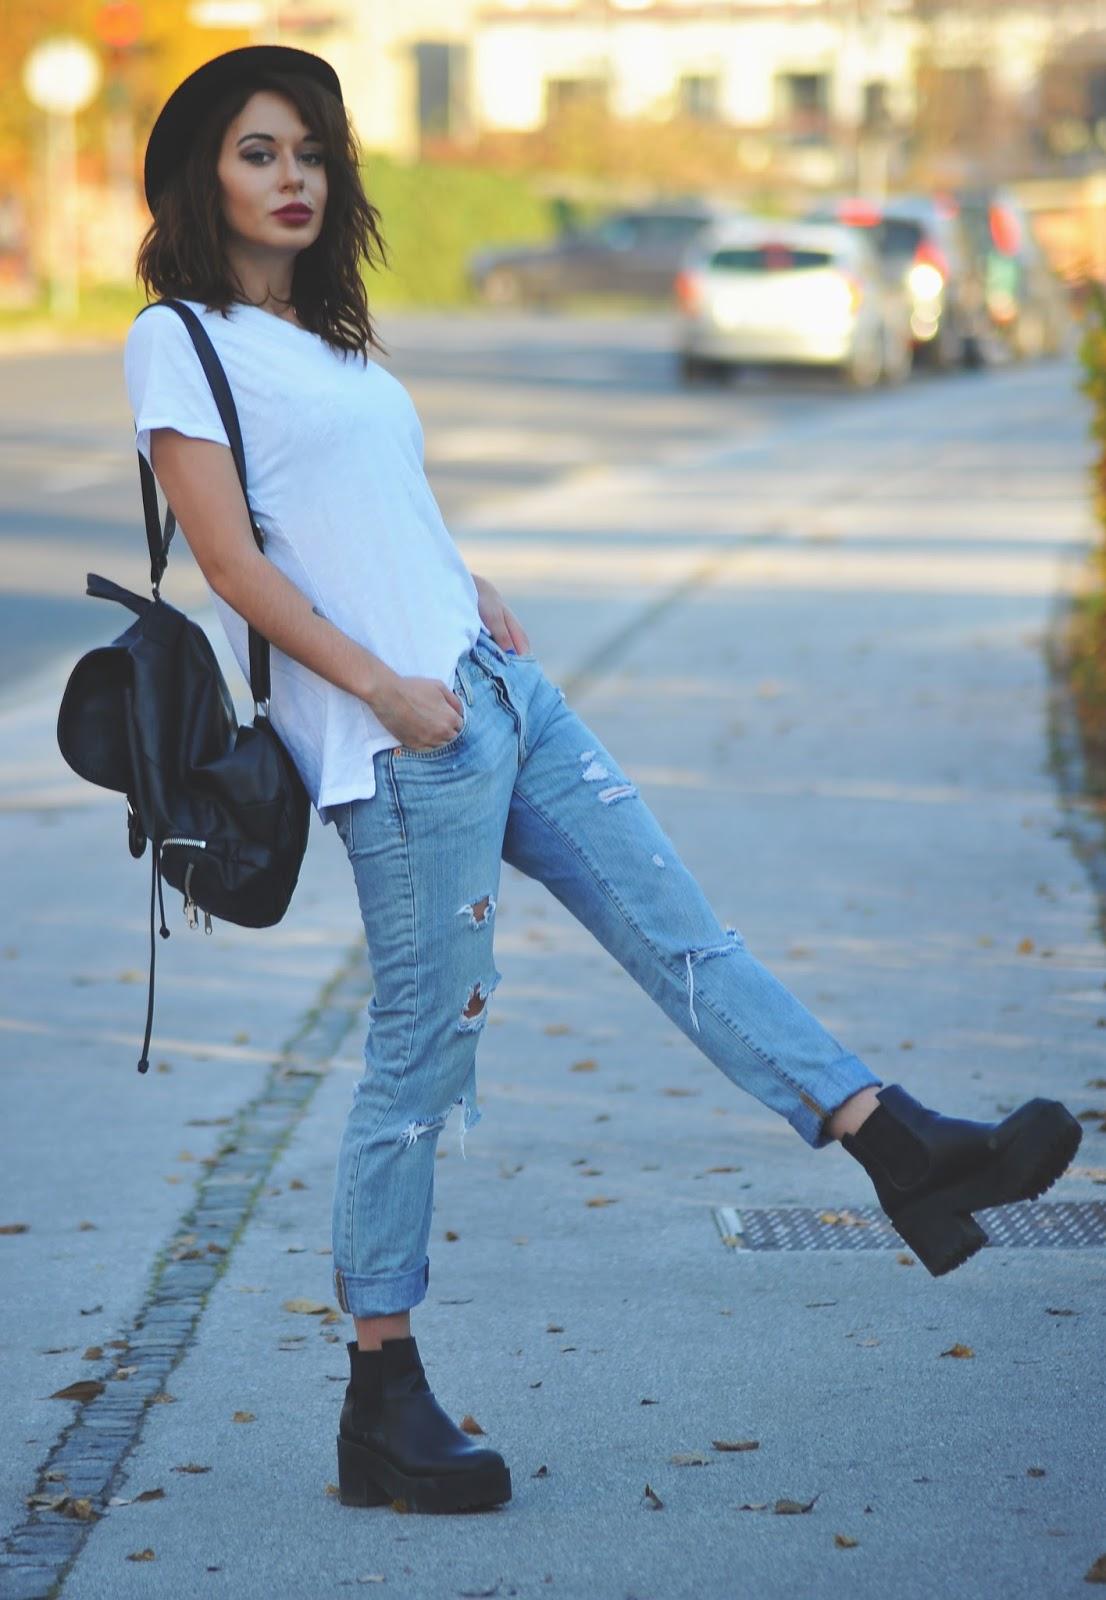 Blue jeans, white shirt - Posh Underground - photo#16